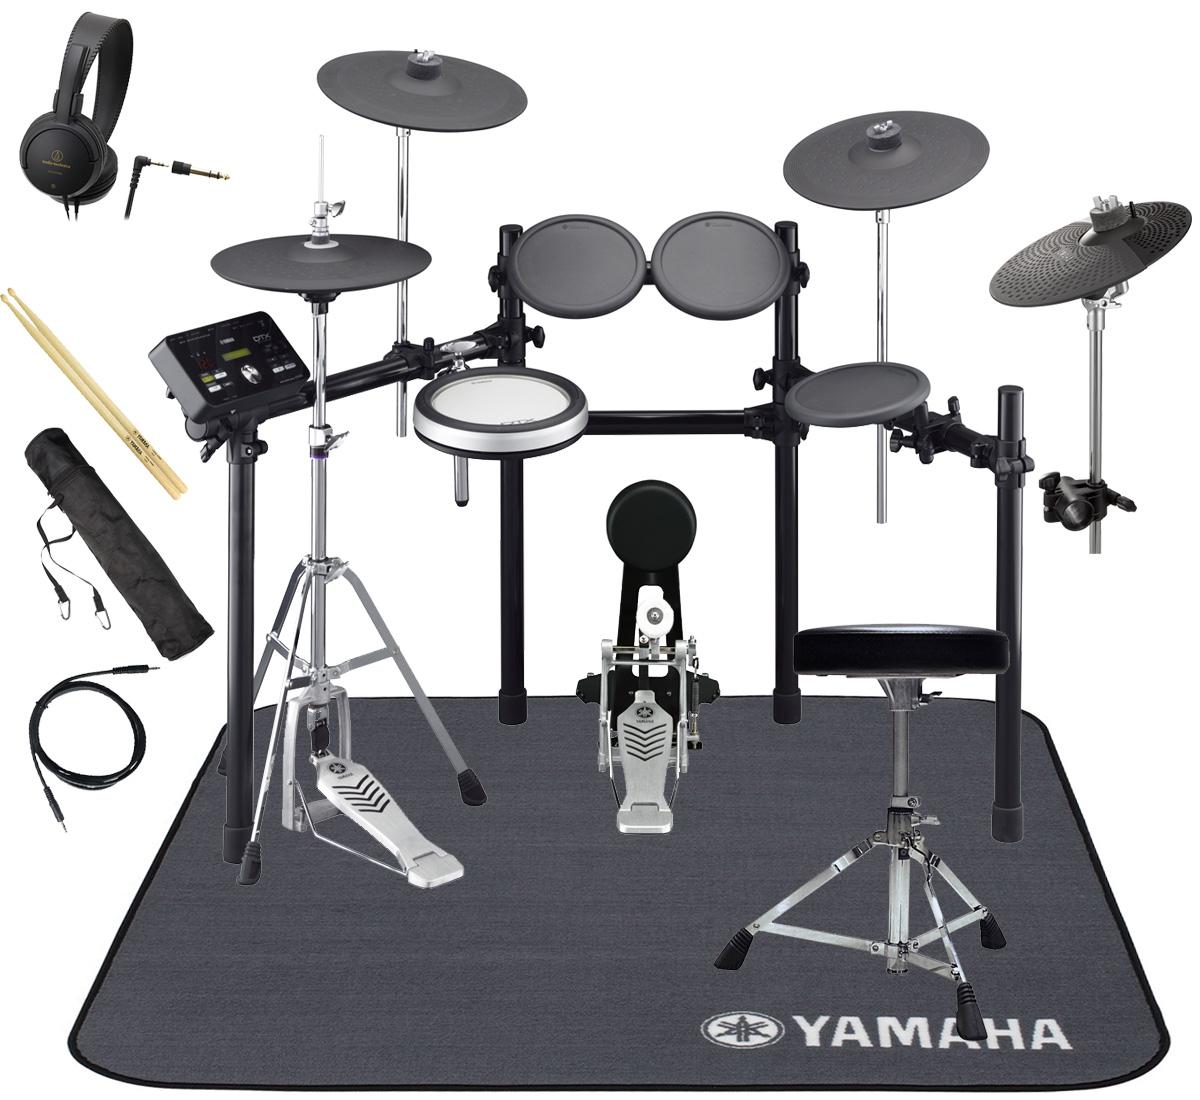 YAMAHA 電子ドラム DTX532KFS 3シンバル オリジナルスターターパック 純正マットセット【YRK】